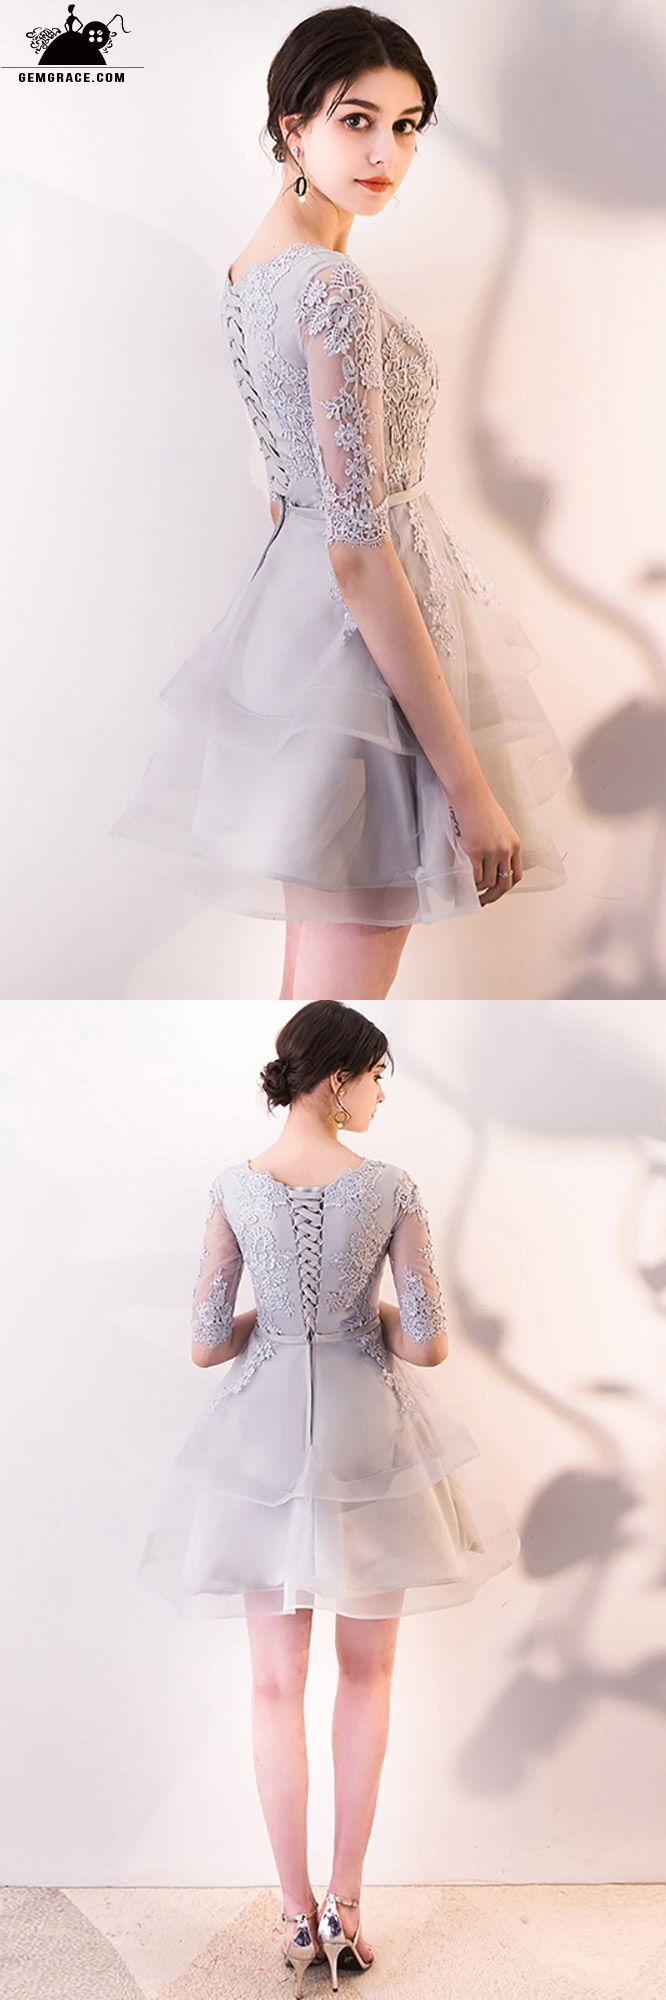 55f599750ba Grey Aline Lace Ruffled Short Homecoming Dress with Sleeves ...